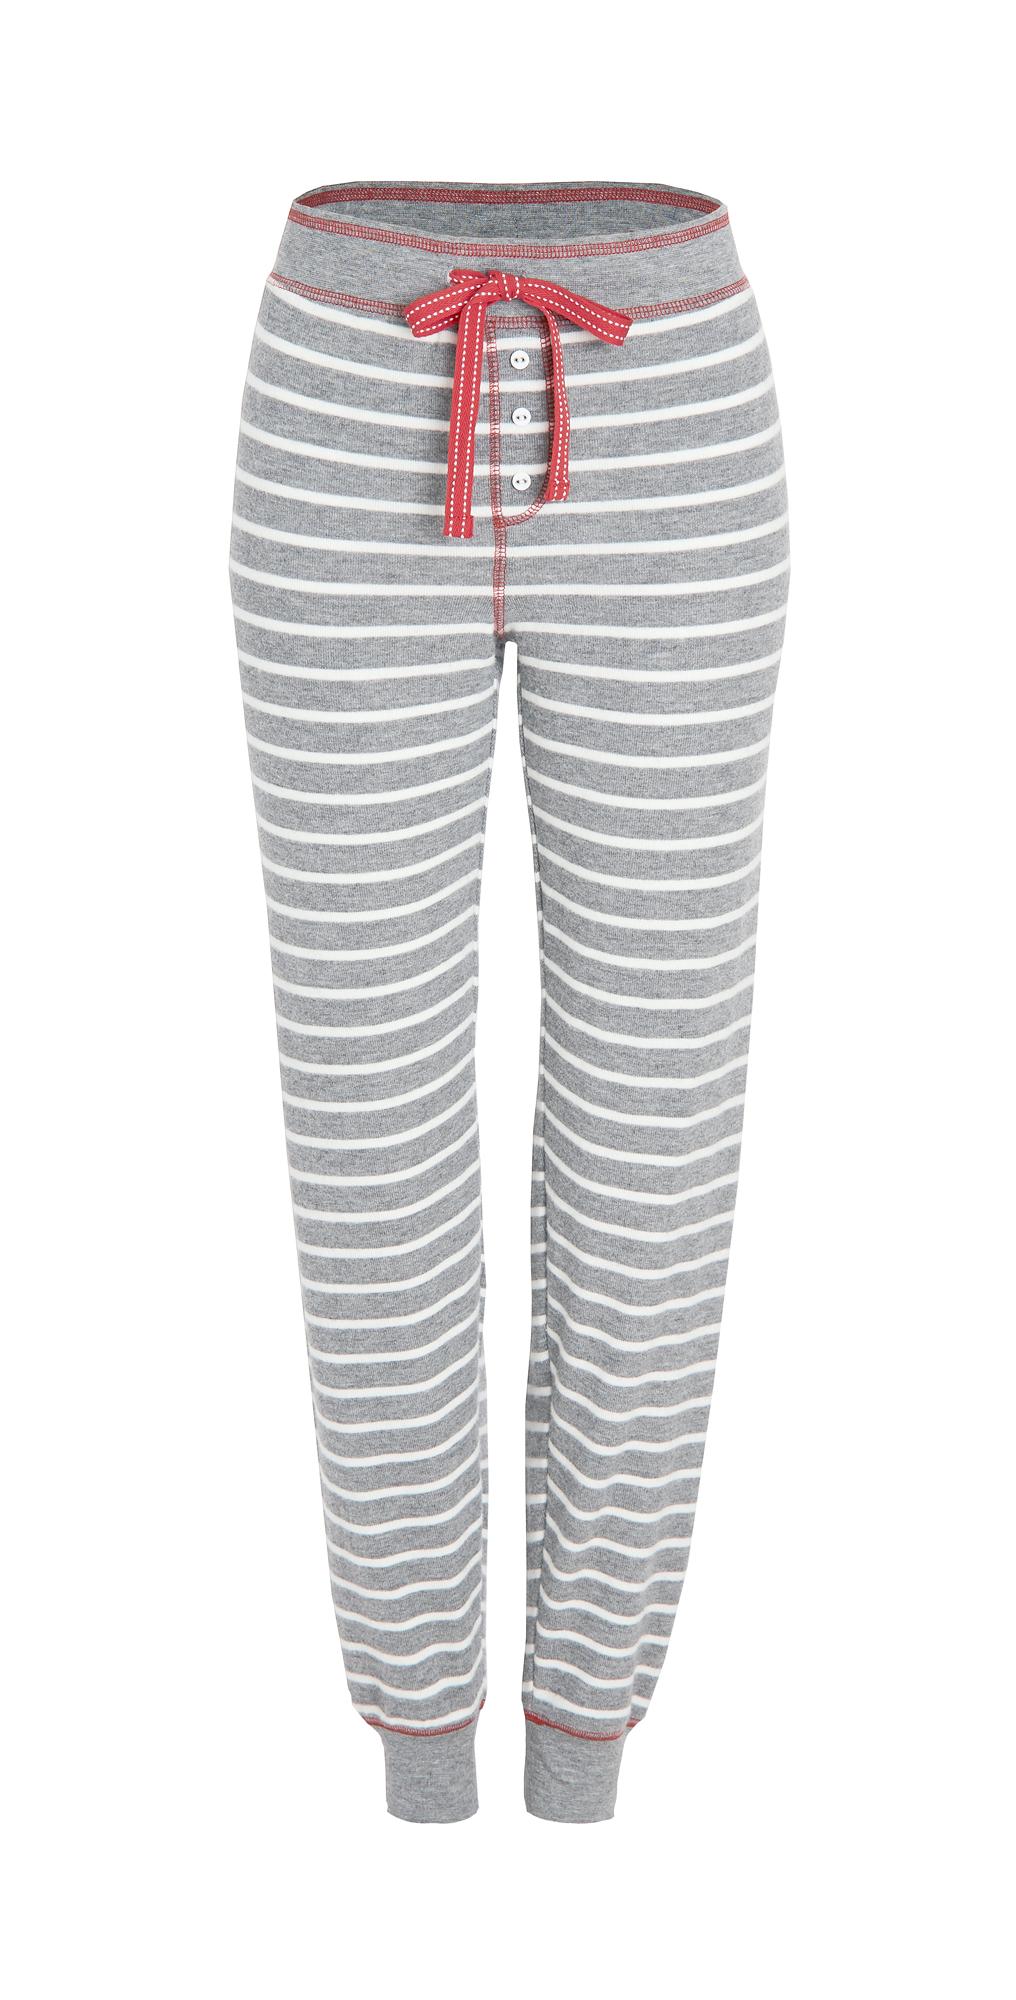 PJ Salvage Joyful Jam Pants